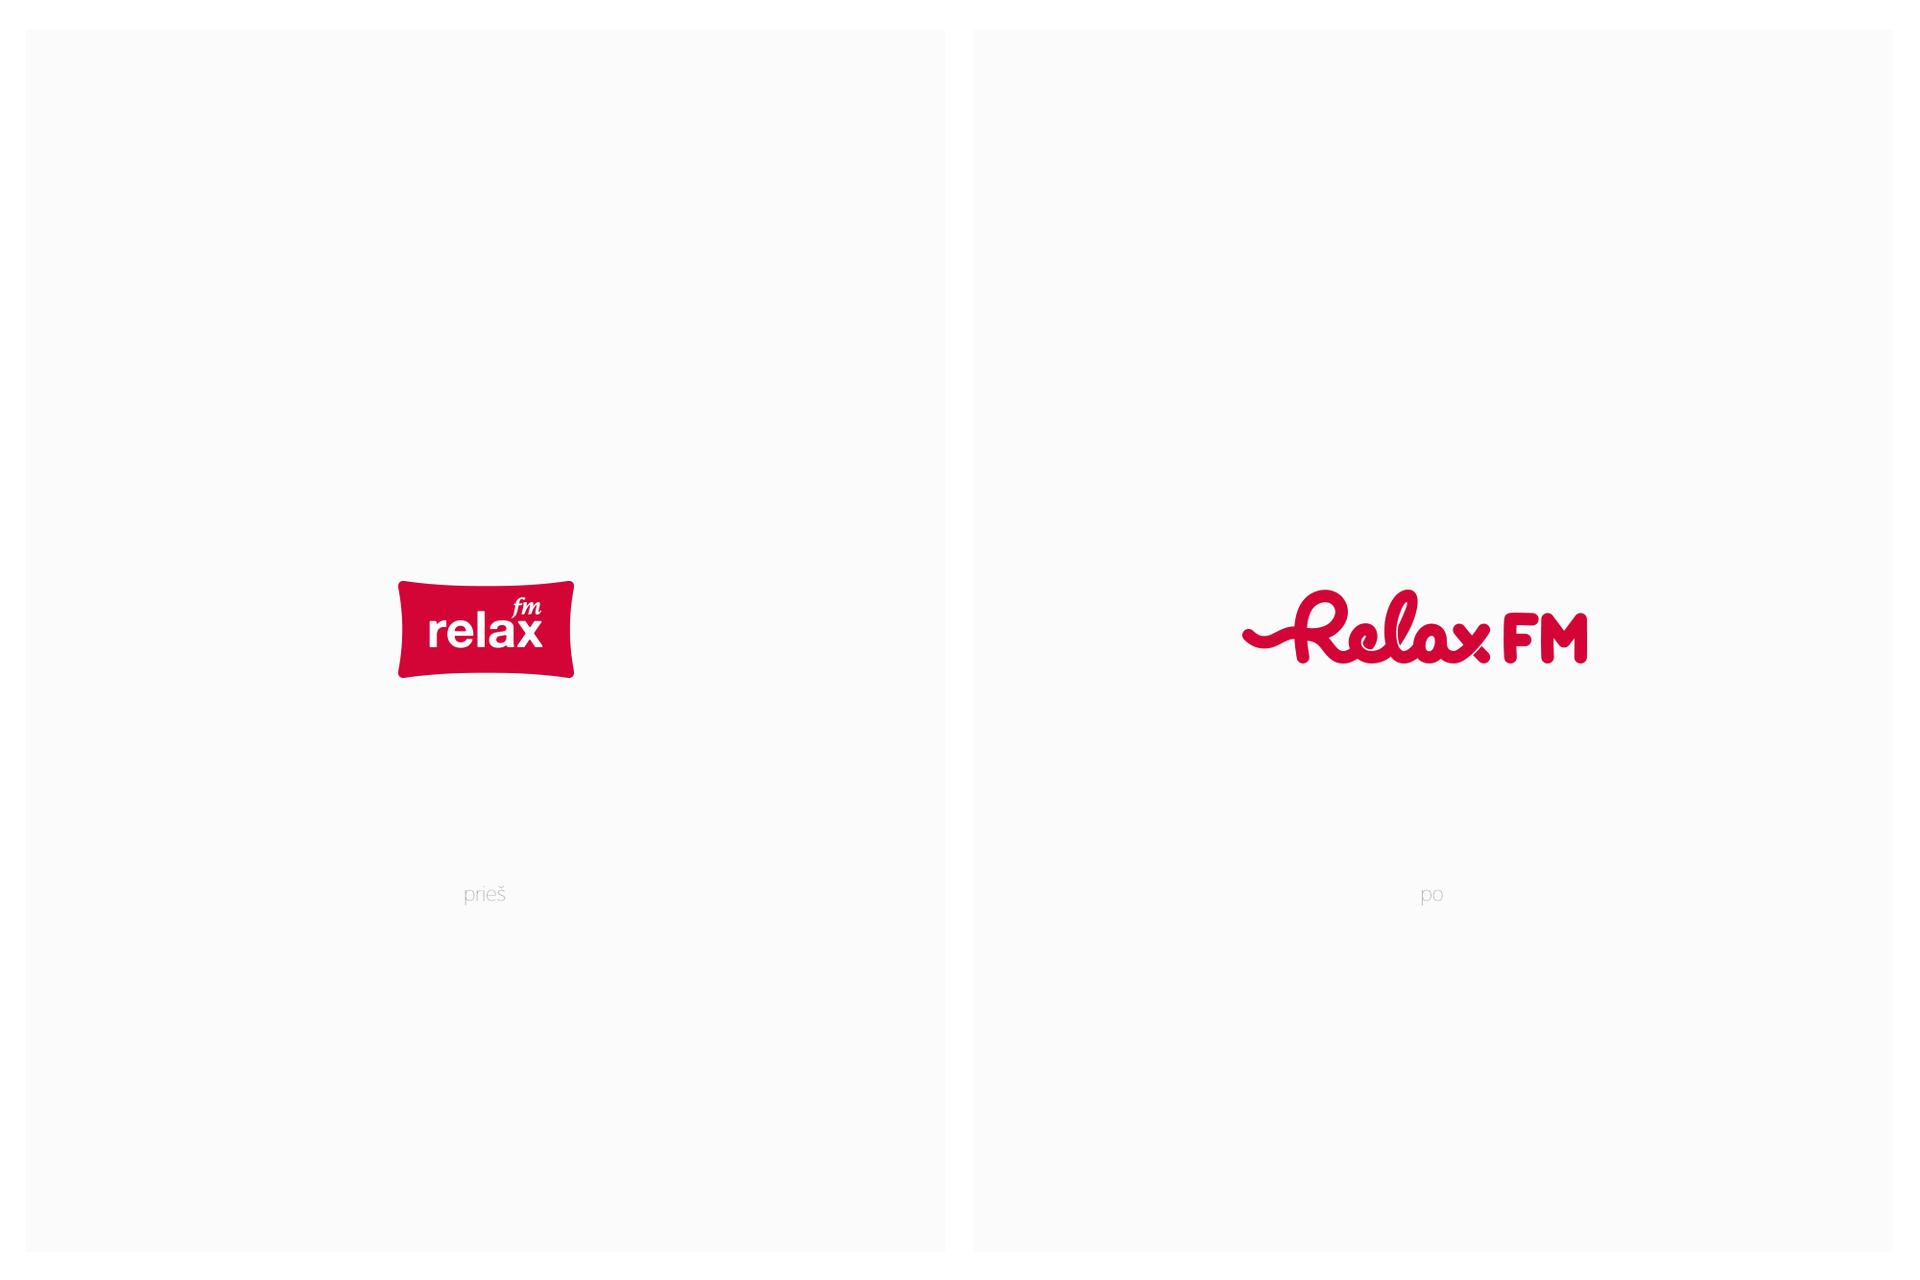 relax fm_logo_web_04.png